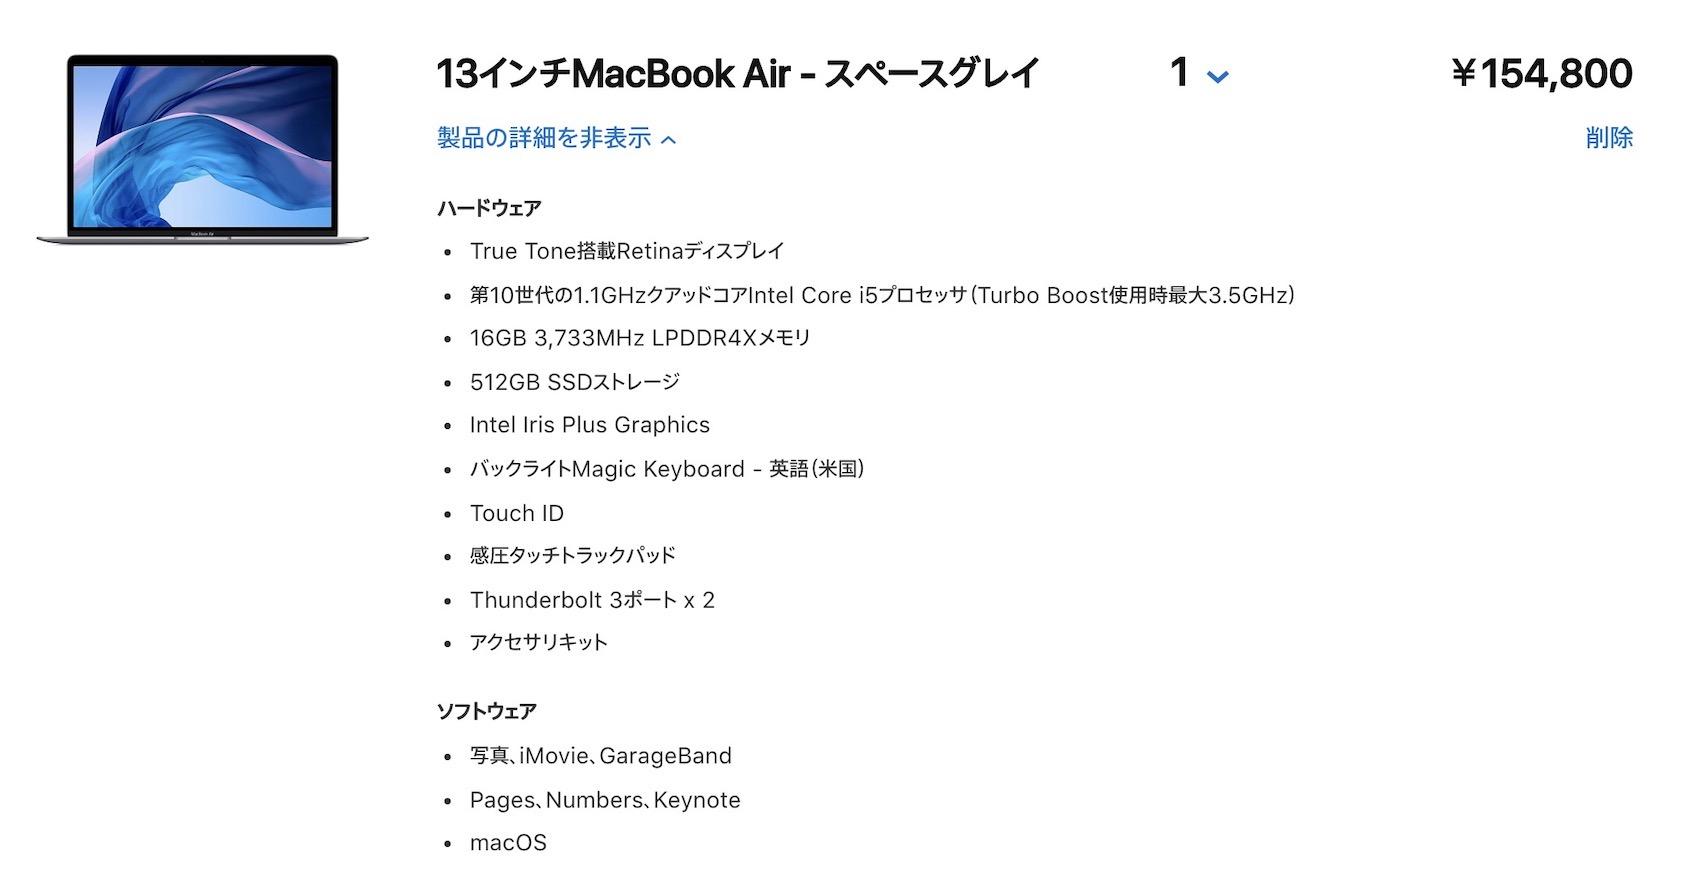 MacBook Air 2020 カスタム